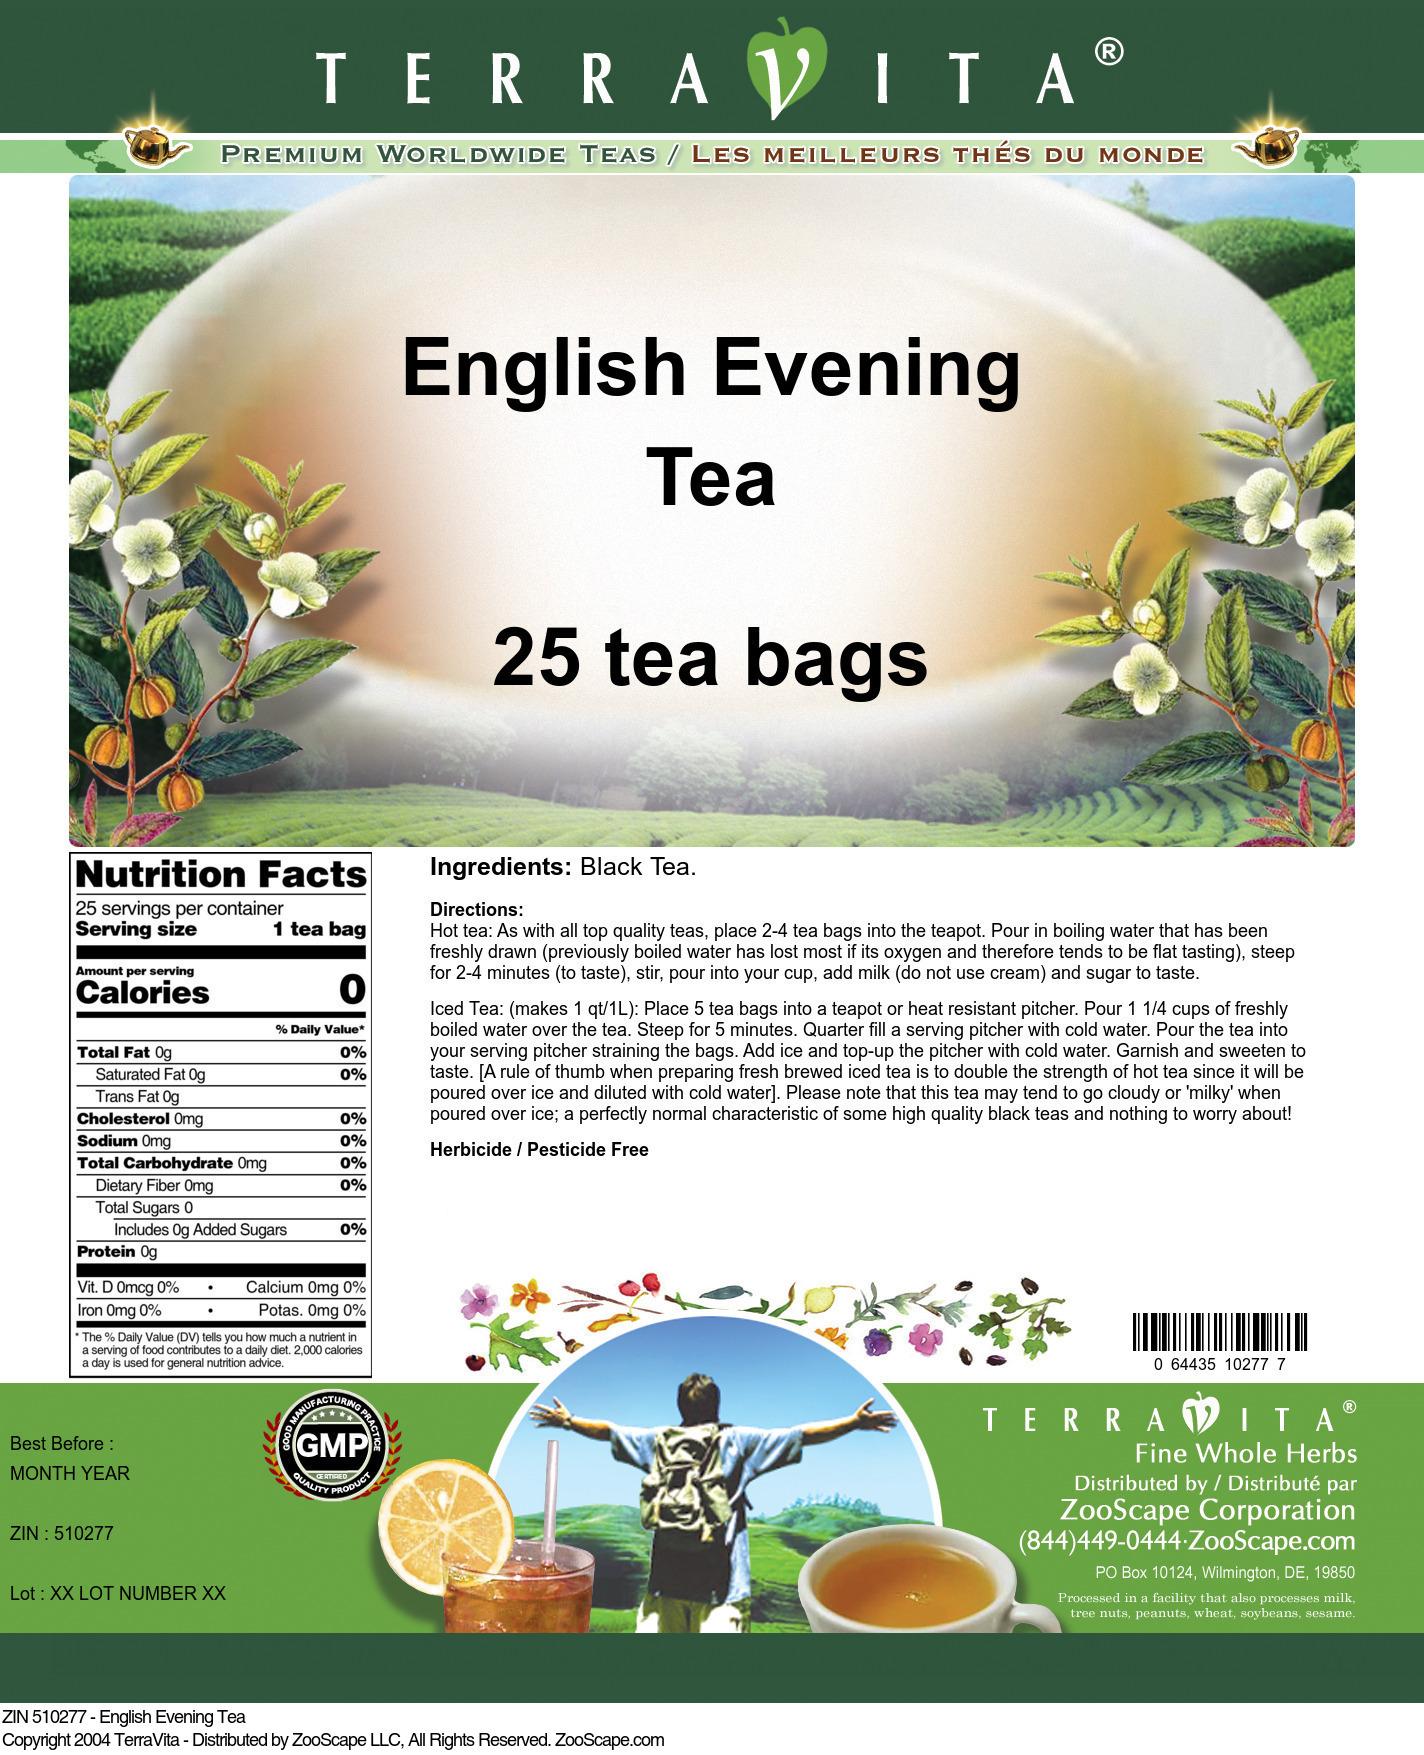 English Evening Tea